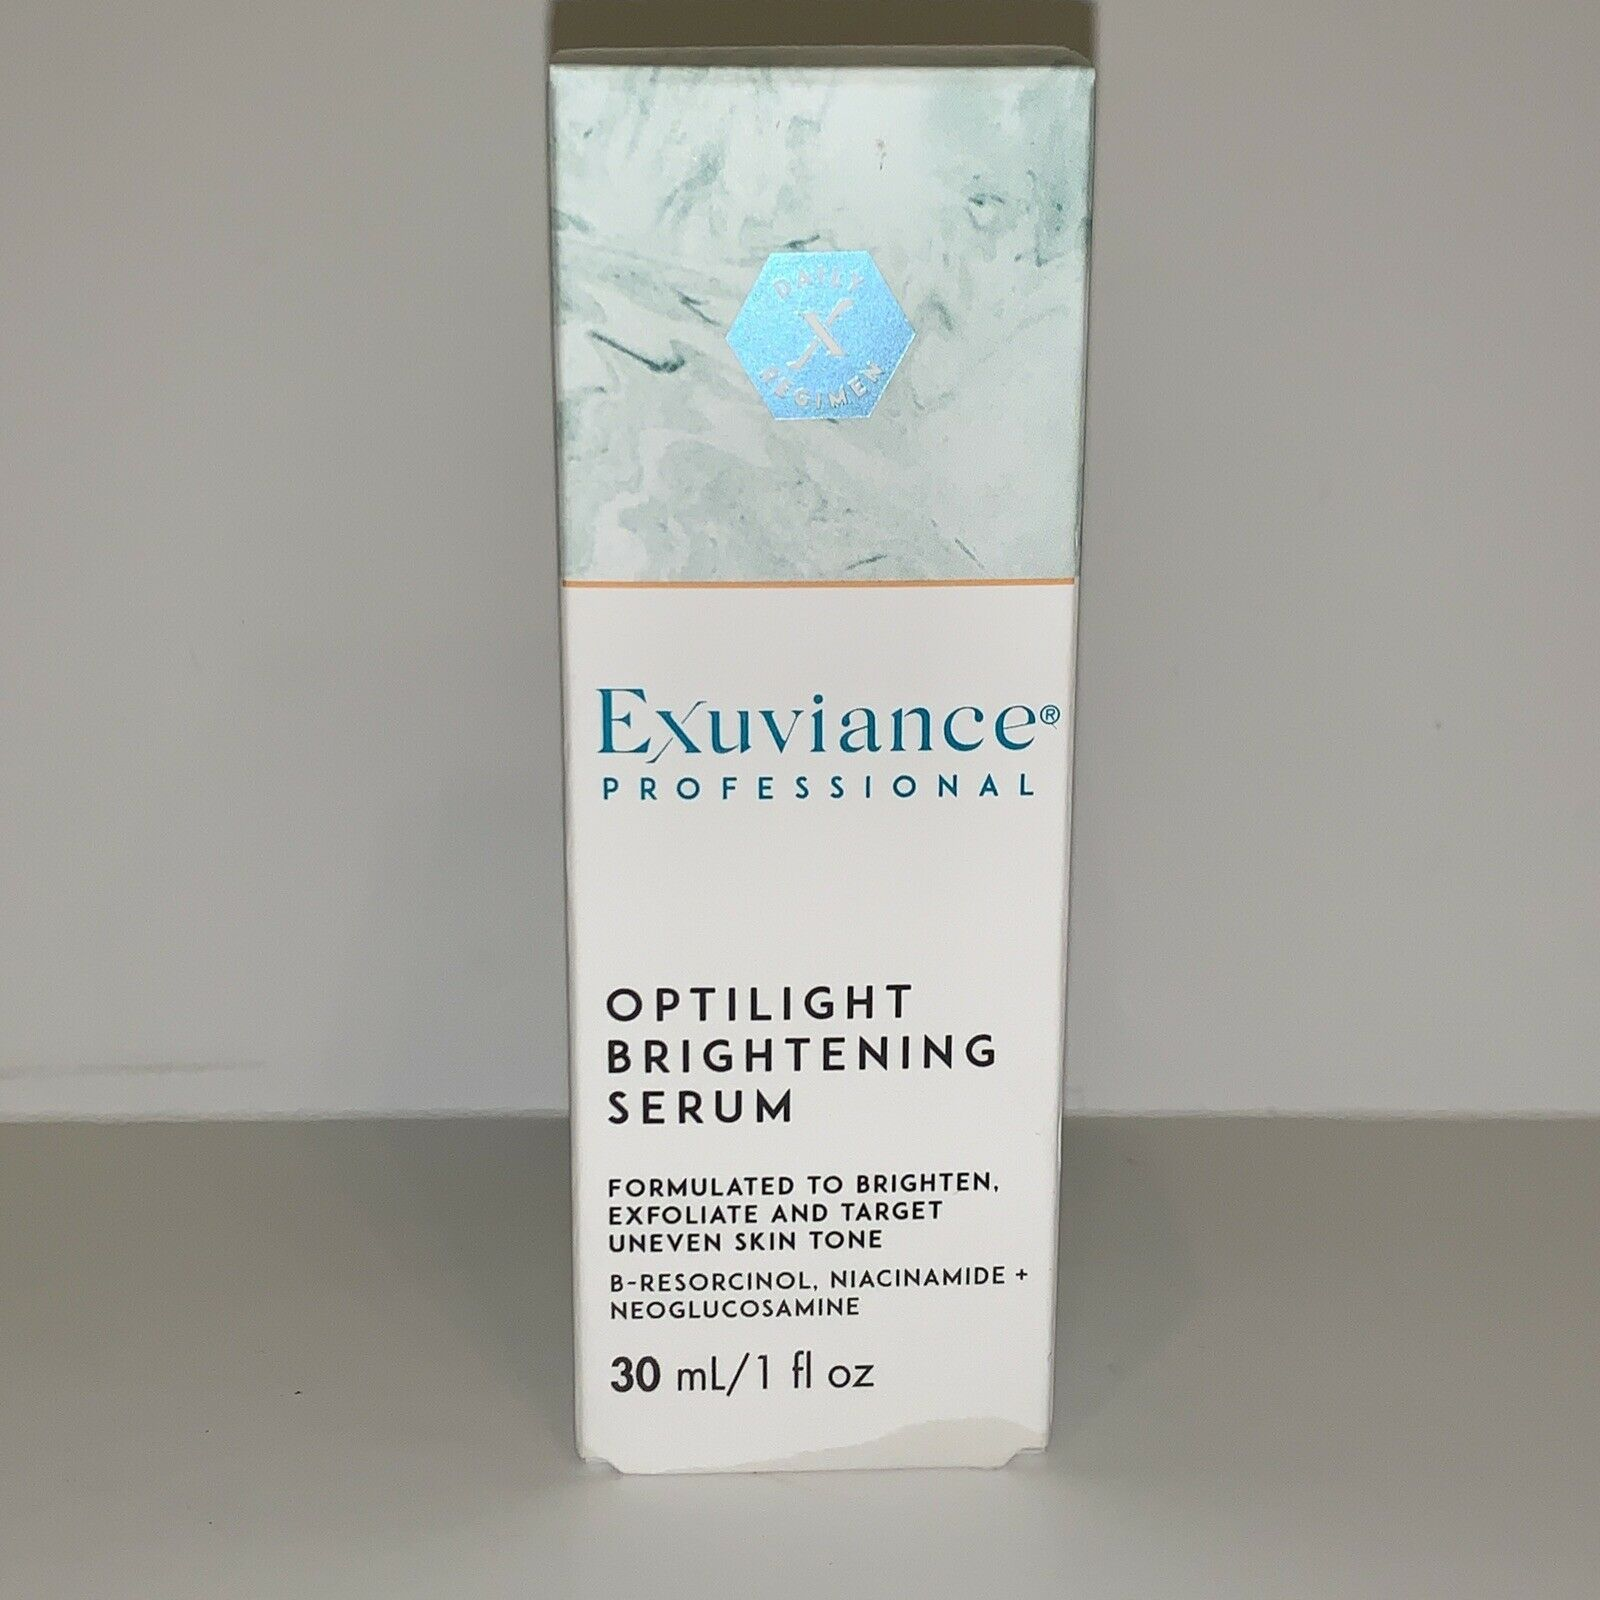 NEW Exuviance Professional Optilight Brightening Serum 1 fl oz Brighten Face NIB - $15.85